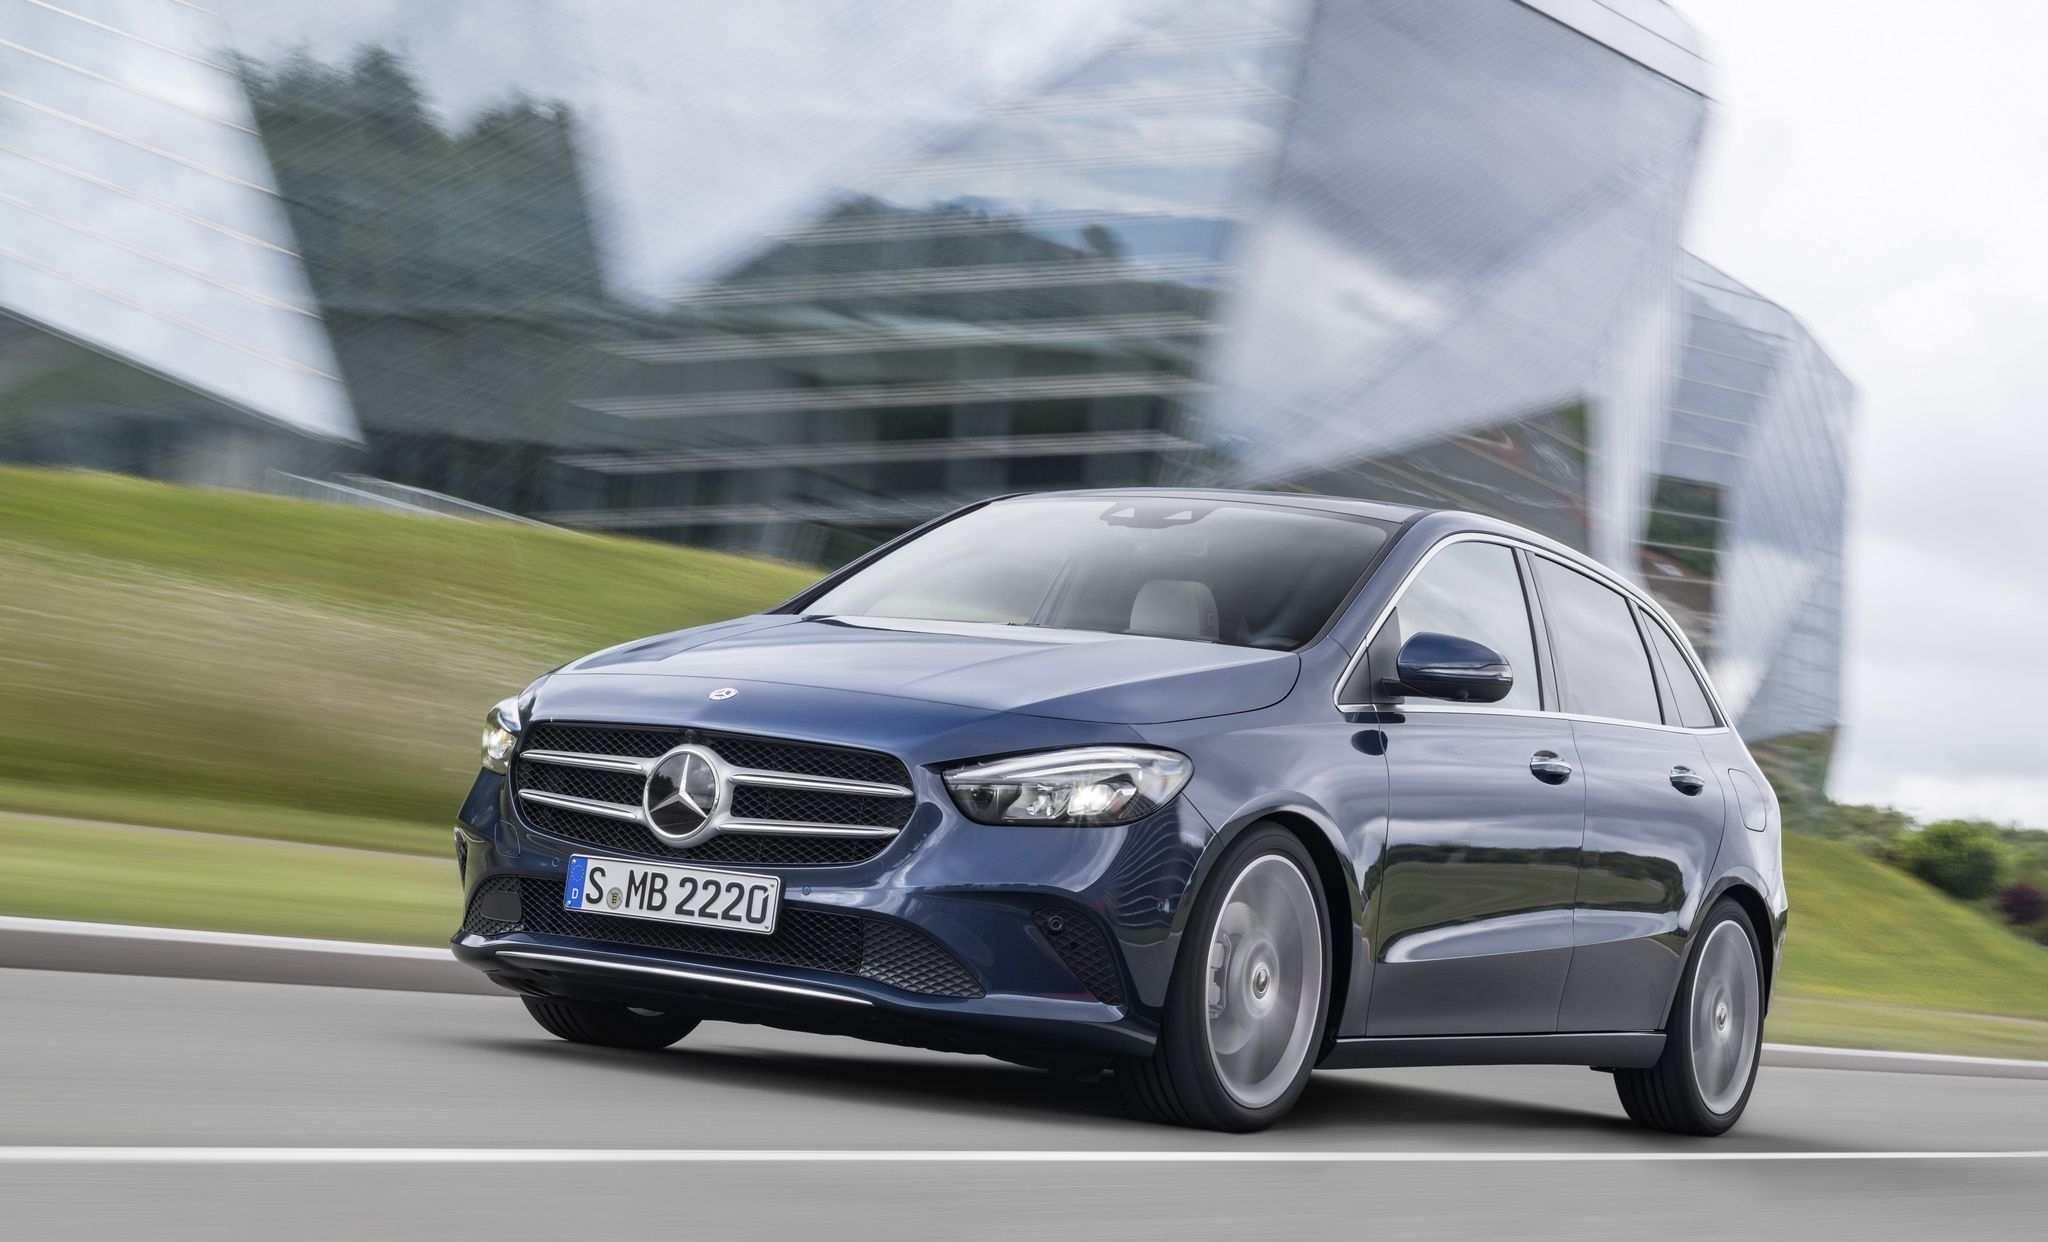 56 All New Mercedes B Klasse 2019 History with Mercedes B Klasse 2019